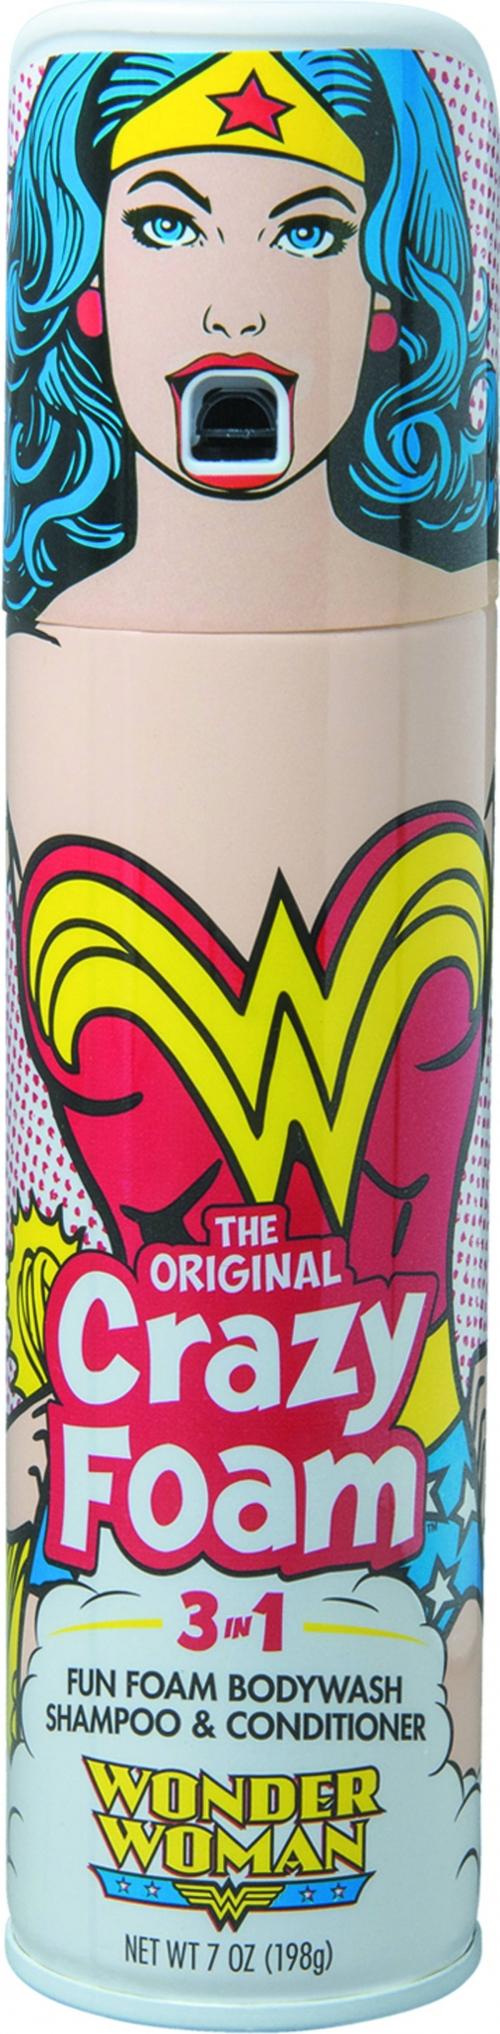 crazy-foam-wonder-woman